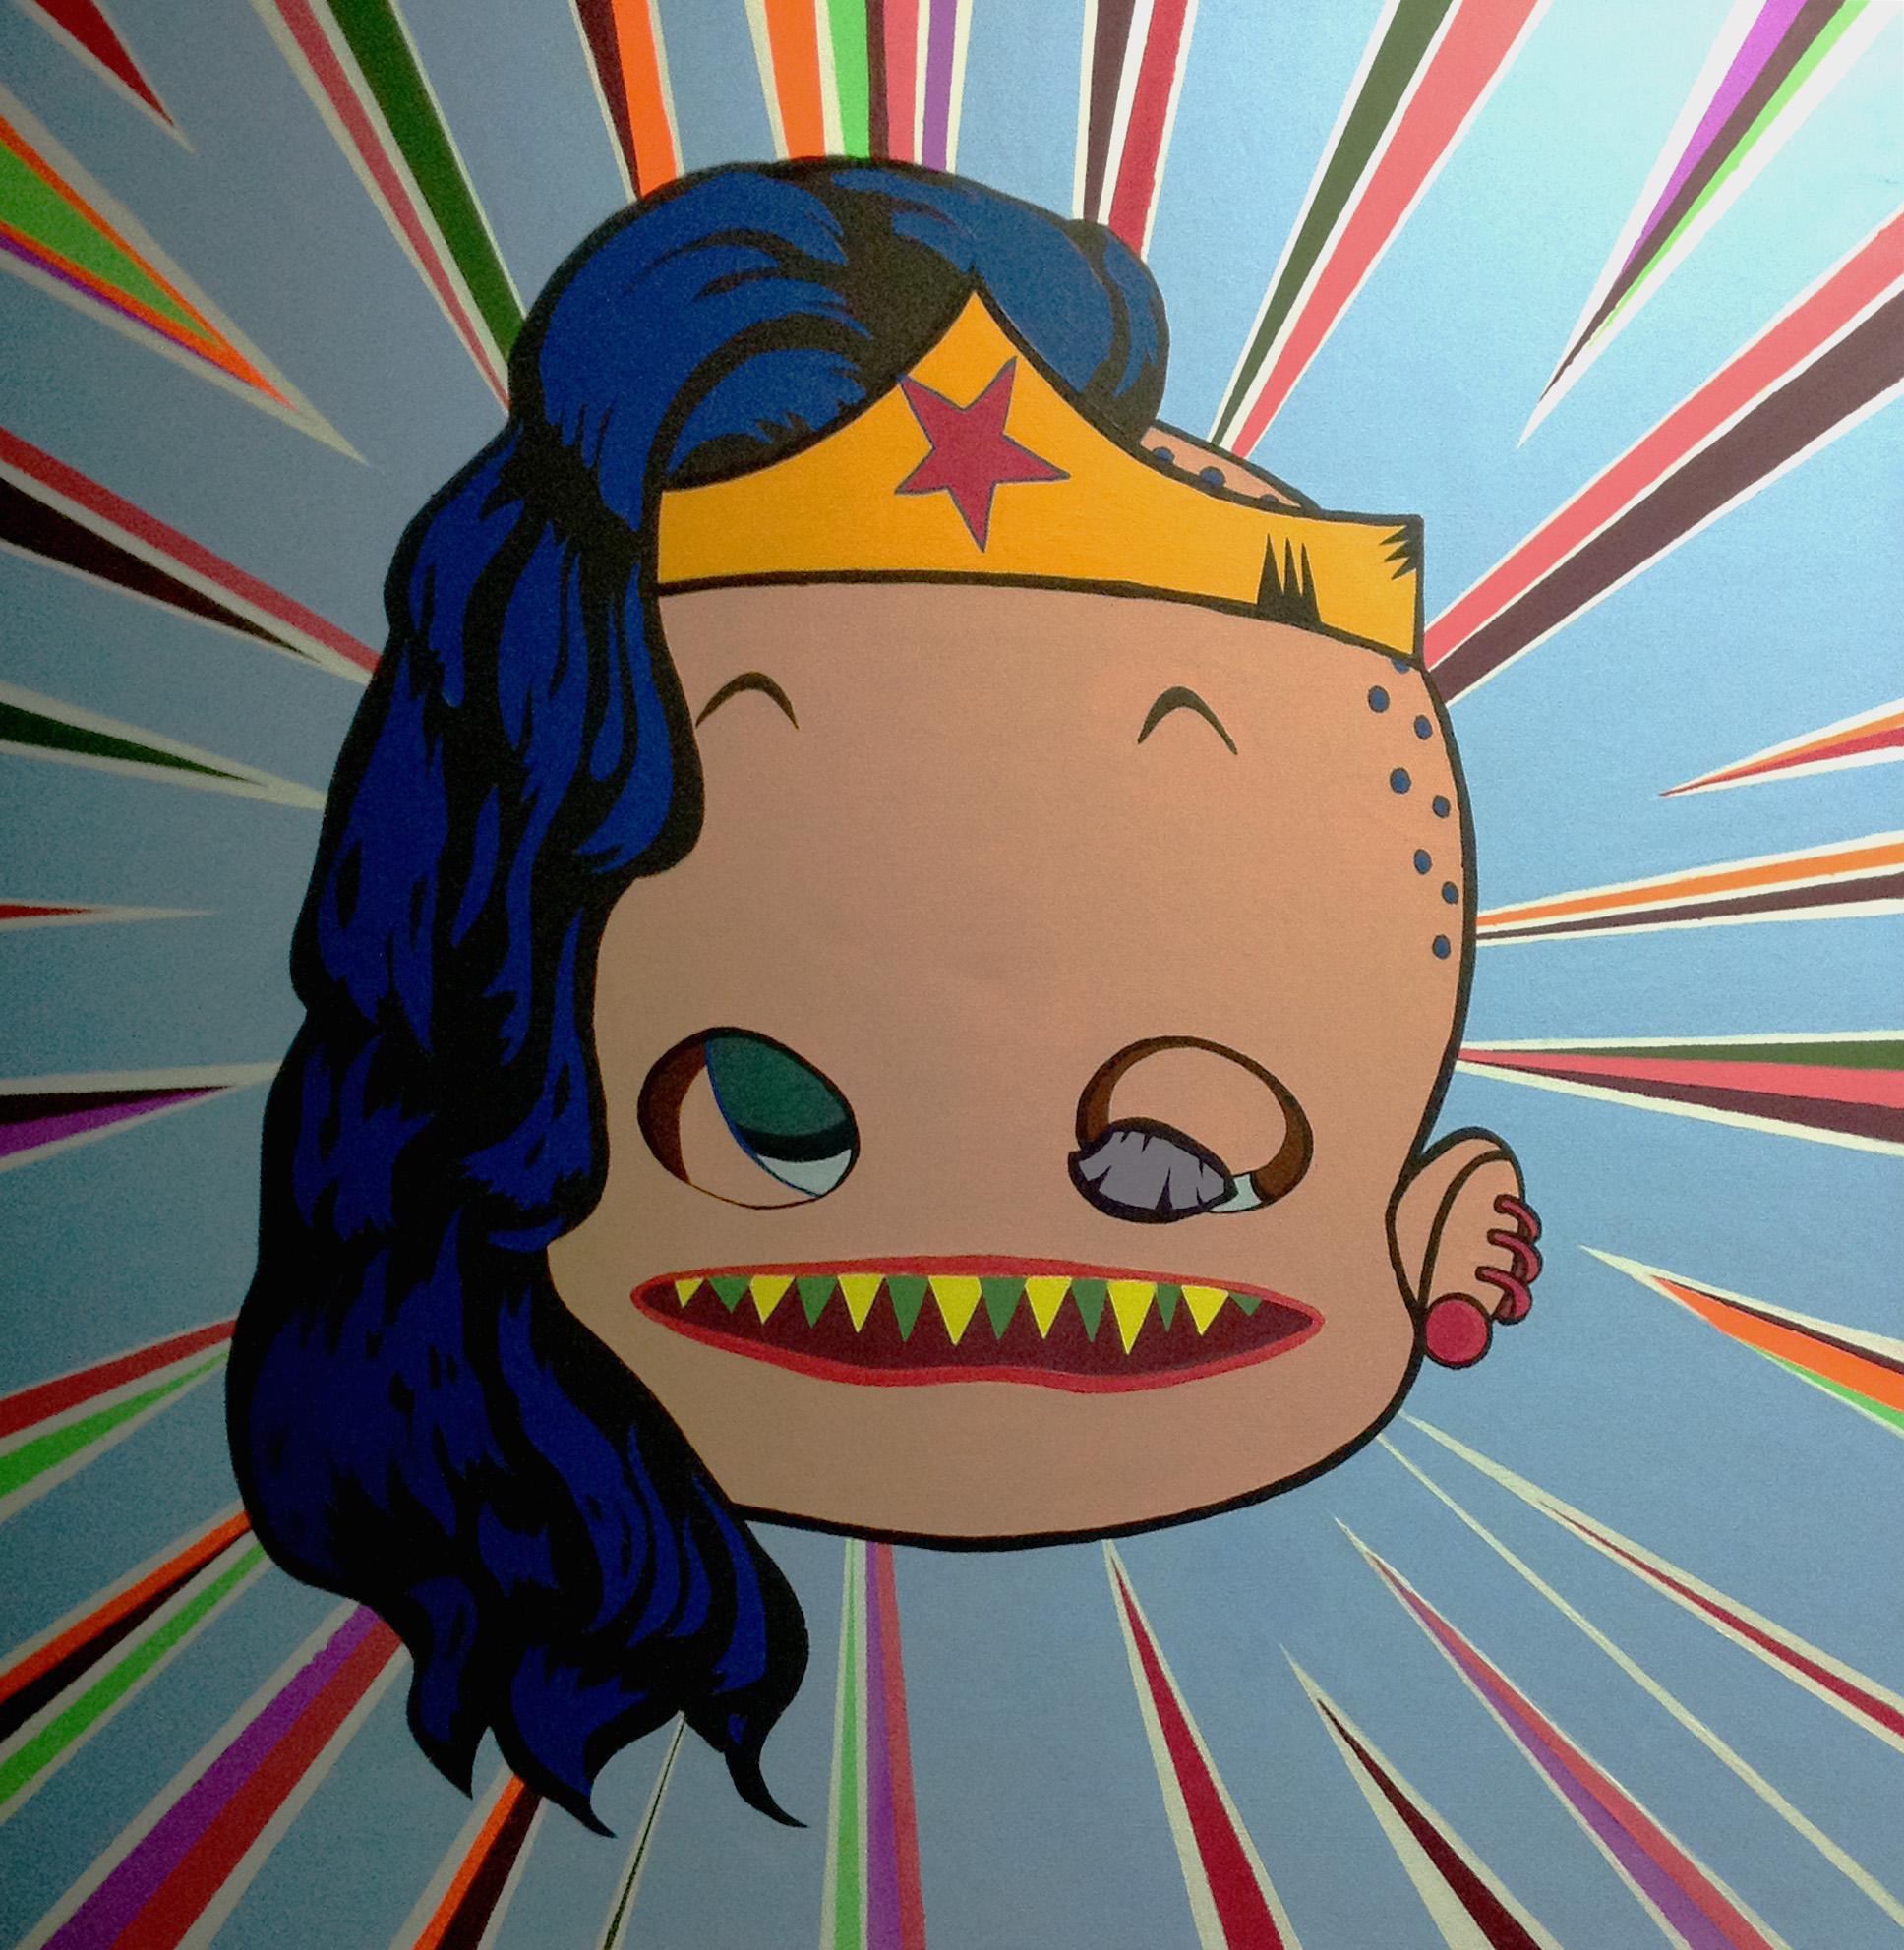 The Dolls: Wonder Woman (As Bonecas: Mulher Maravilha)